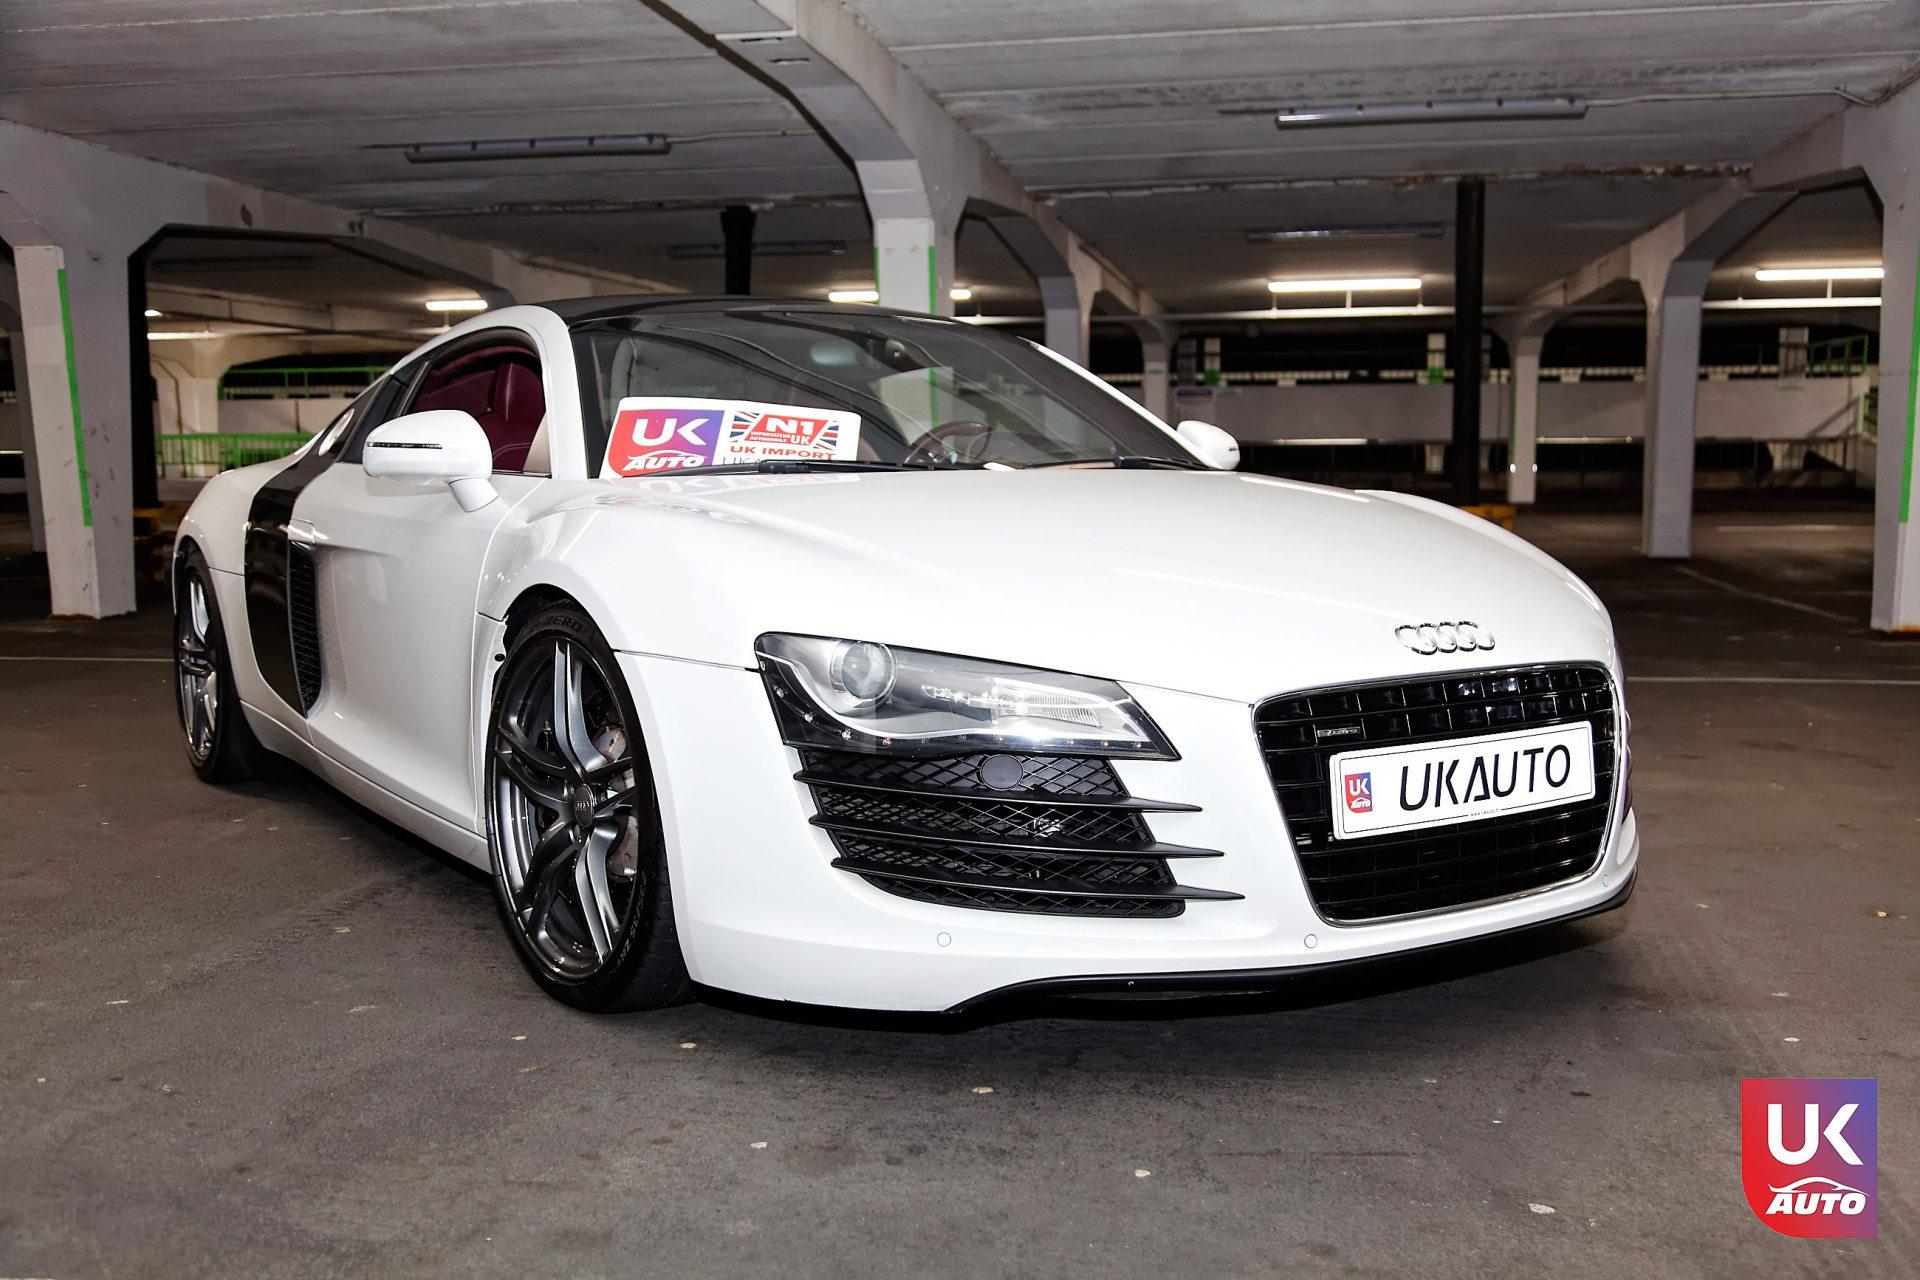 Audi R8 Import audi r8 lhd angleterre audi R8 V8 TFSI AUDI uk importation audi LHD volant a gauche4 DxO - AUDI R8 ANGLETERRE IMPORTATION AUDI R8 UK IMPORT SUPERCAR FELICITATION A CHARLES POUR CET IMPORT